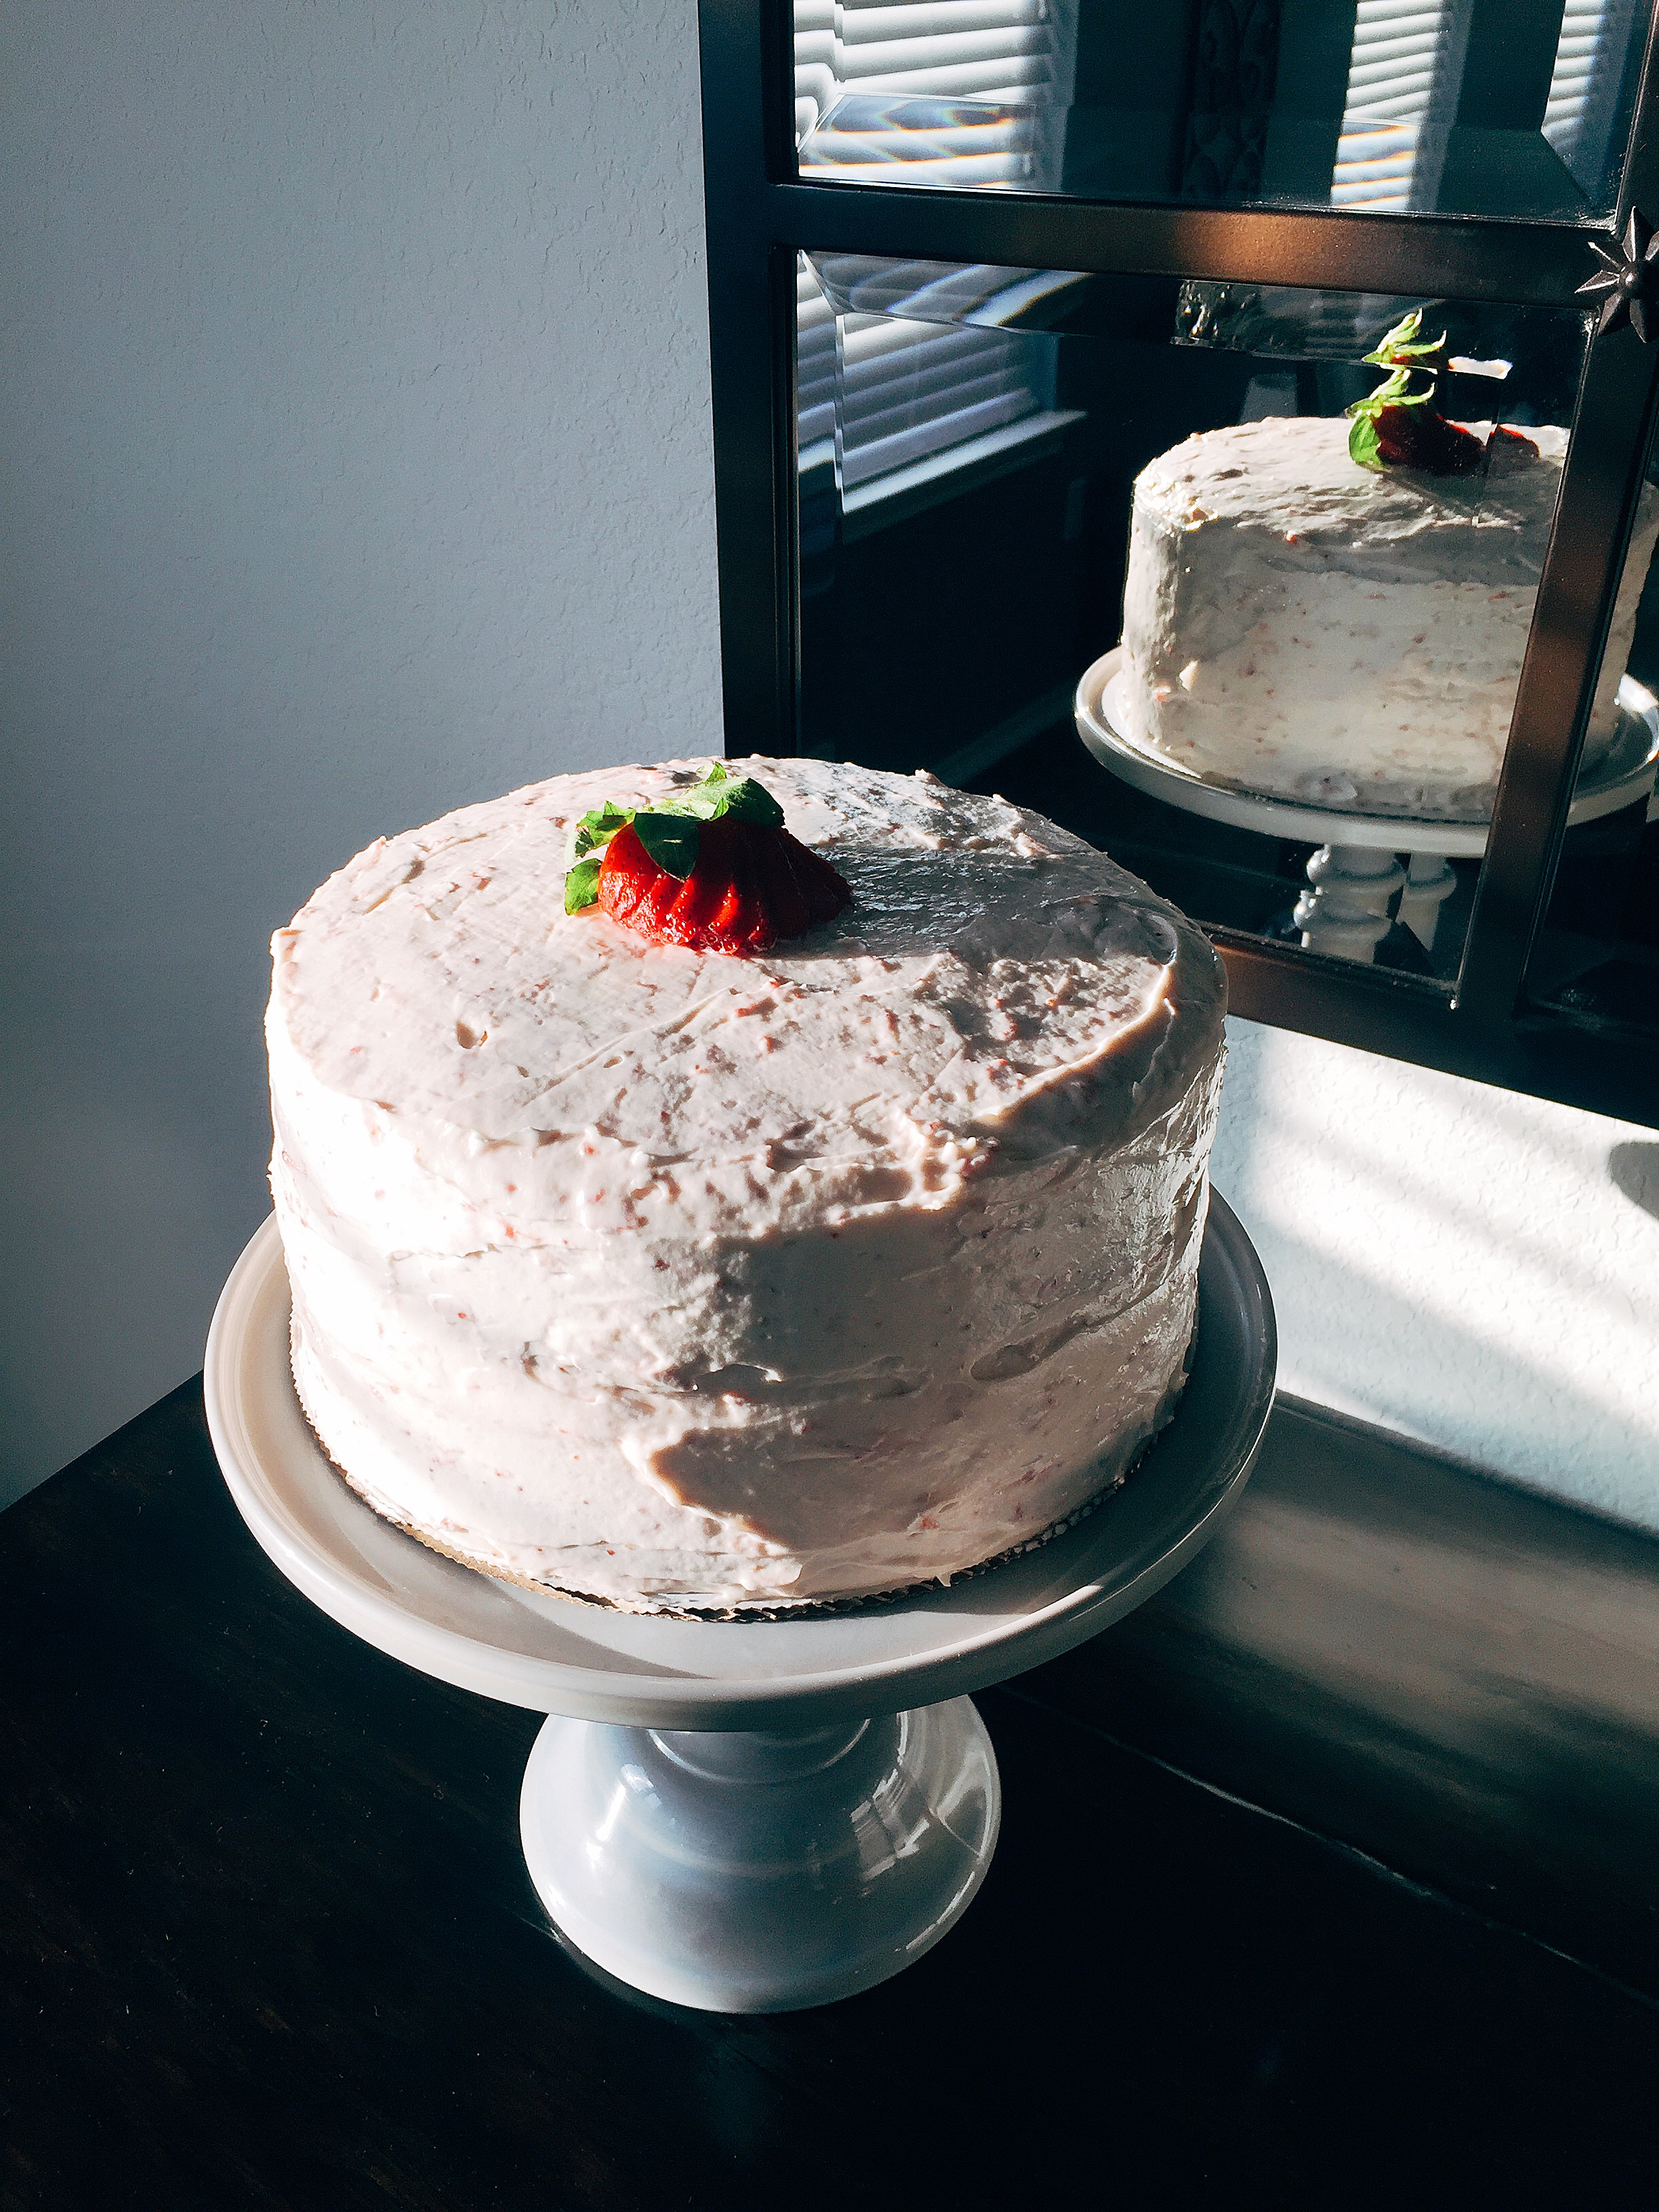 VANILLA CAKE with STRAWBERRY CREAM CHEESE FROSTING